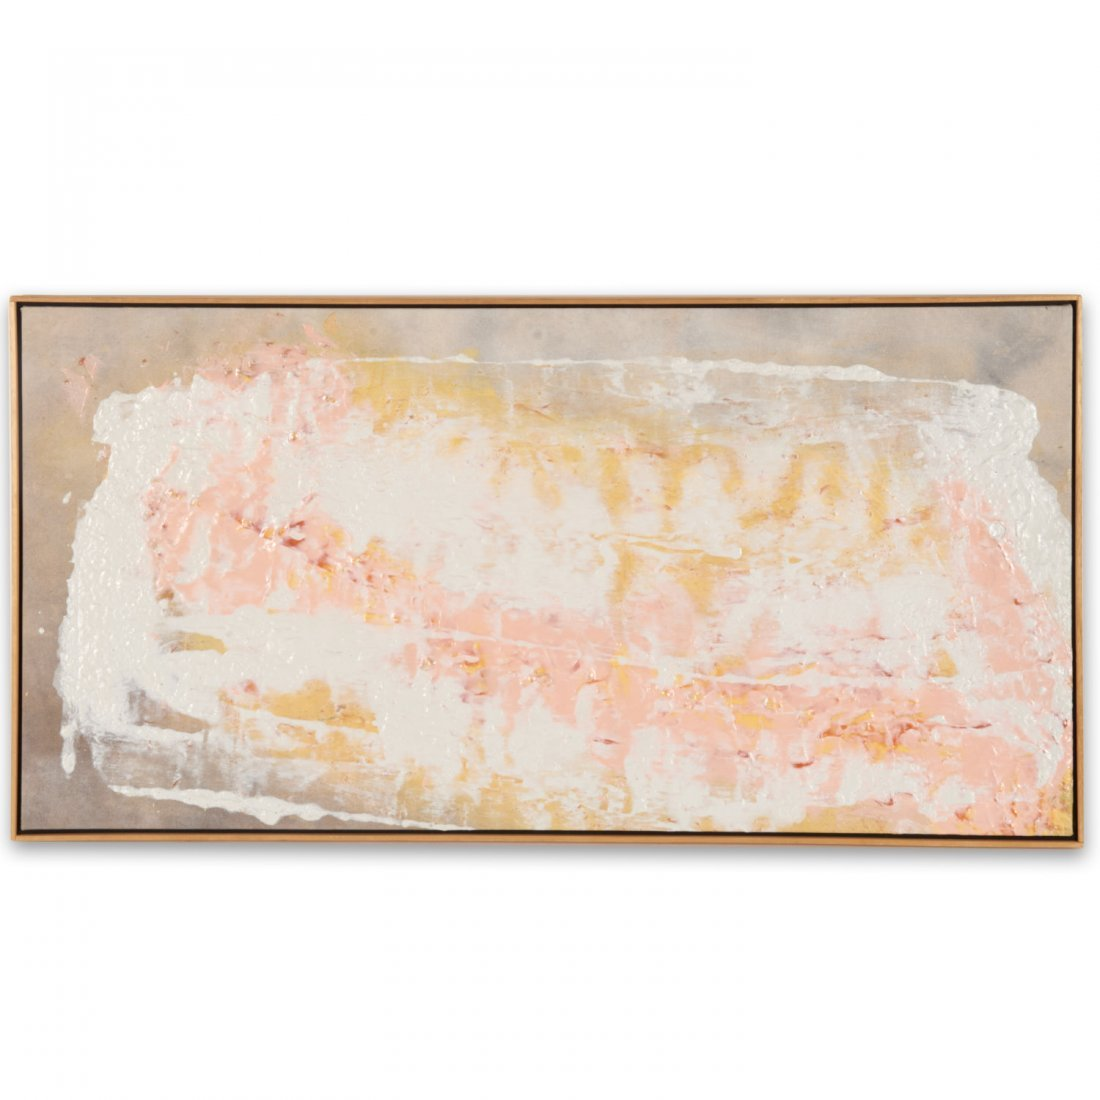 Yvonne Muller, painting